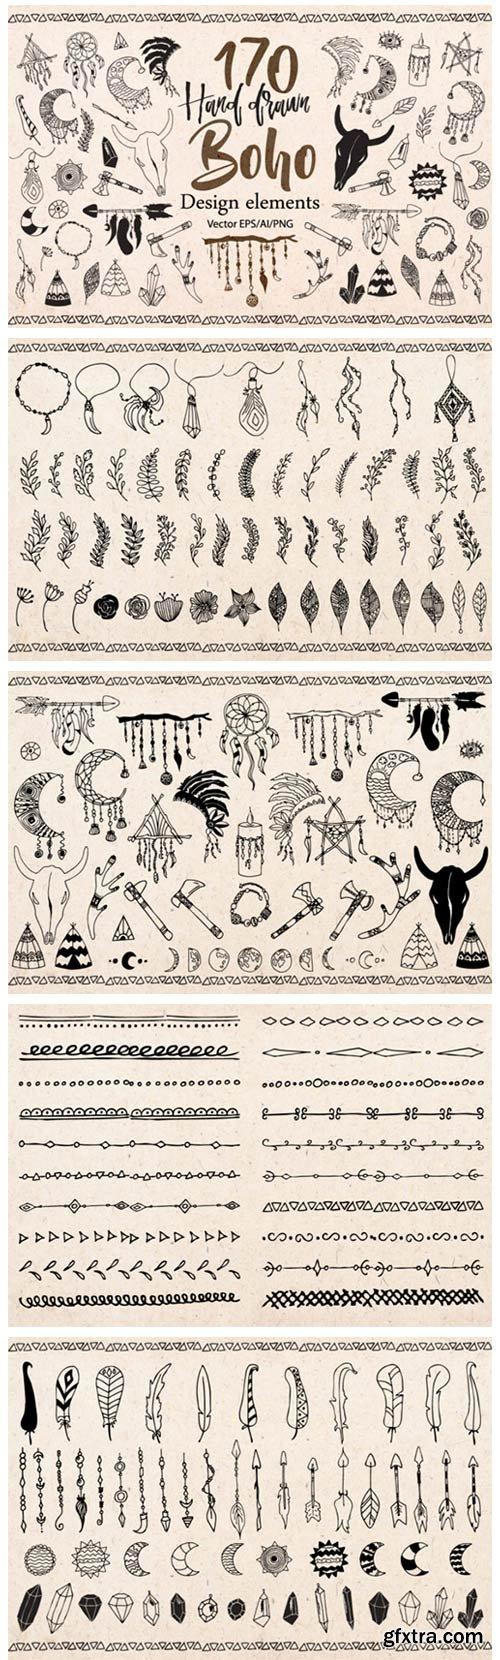 Boho Tribal Design Elements Clipart 1786734